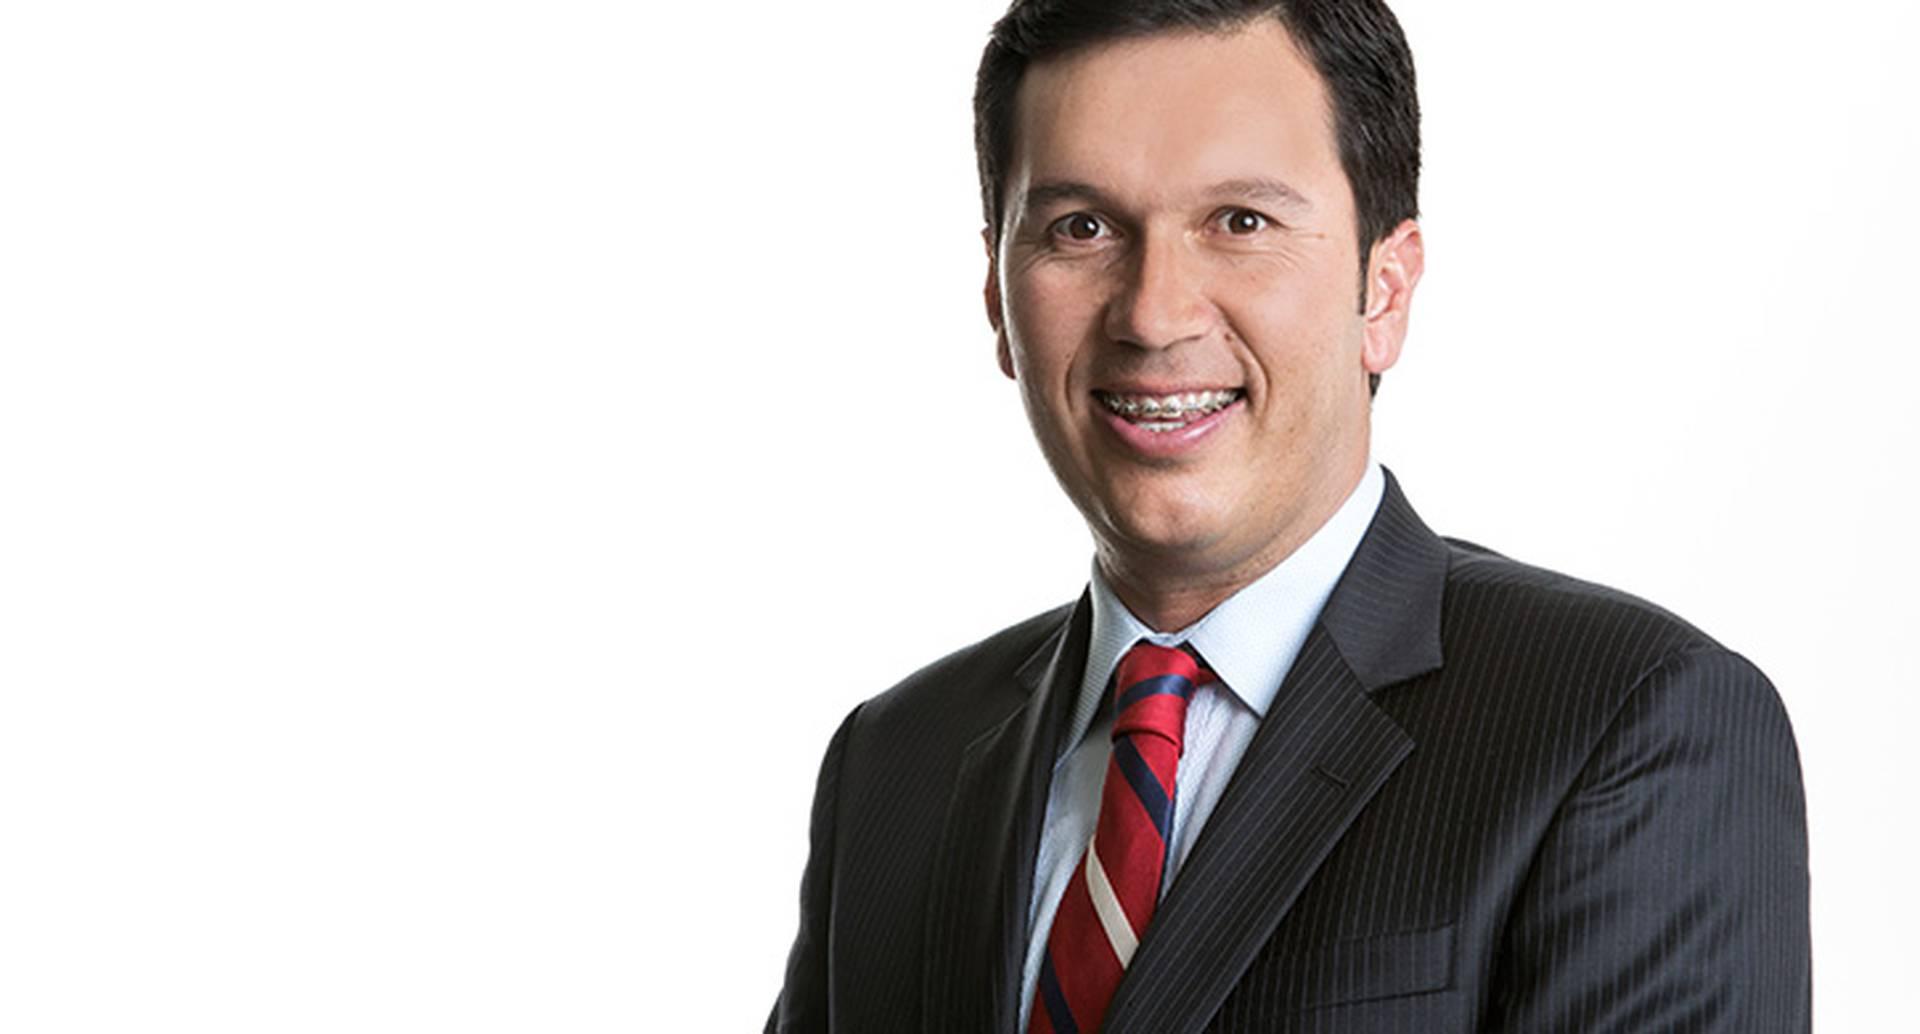 Yury Neill Díaz Aranguren